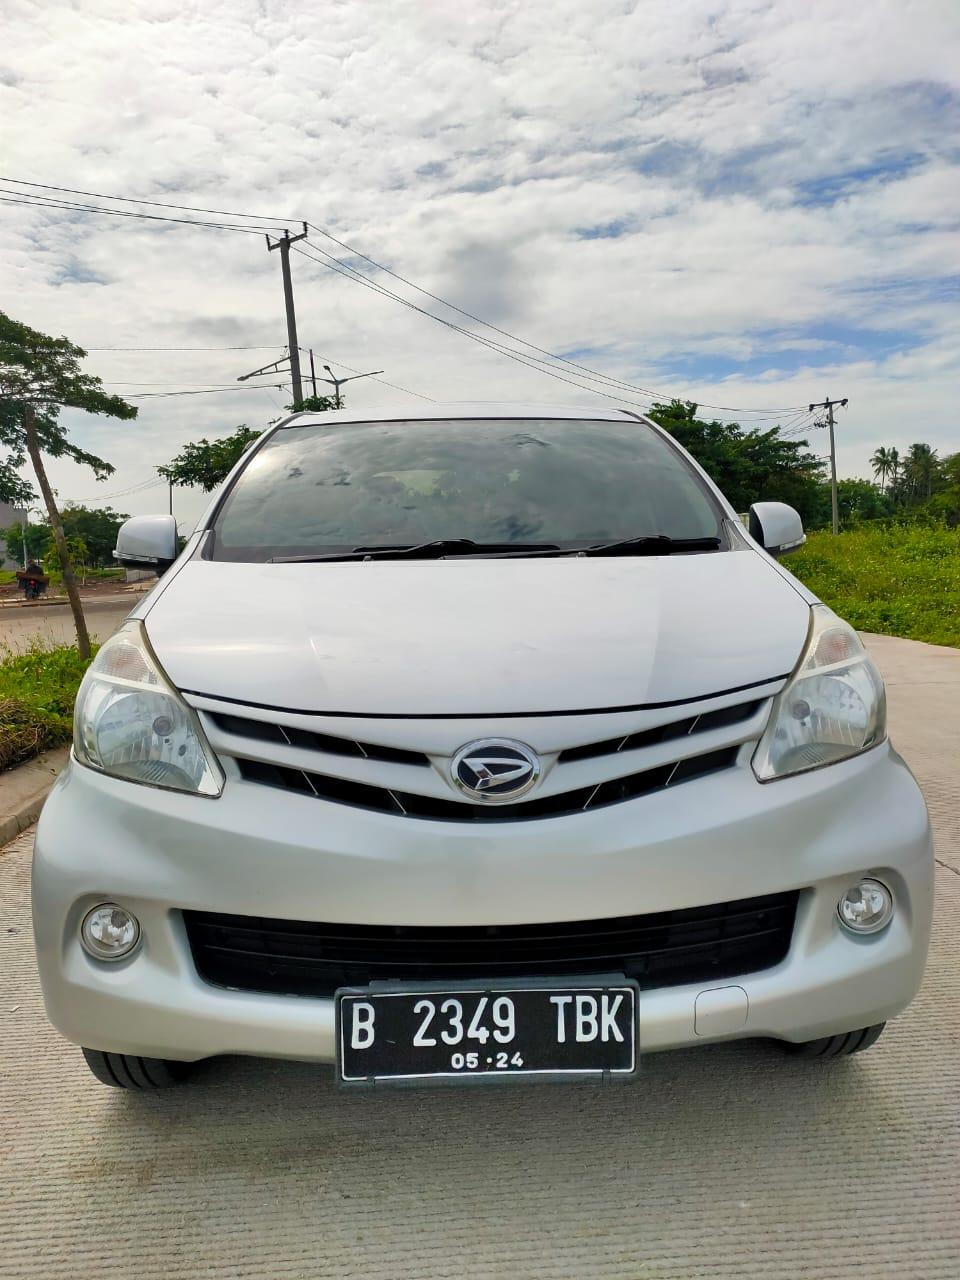 Dijual Mobil Daihatsu Xenia / SILVER Tahun 2013